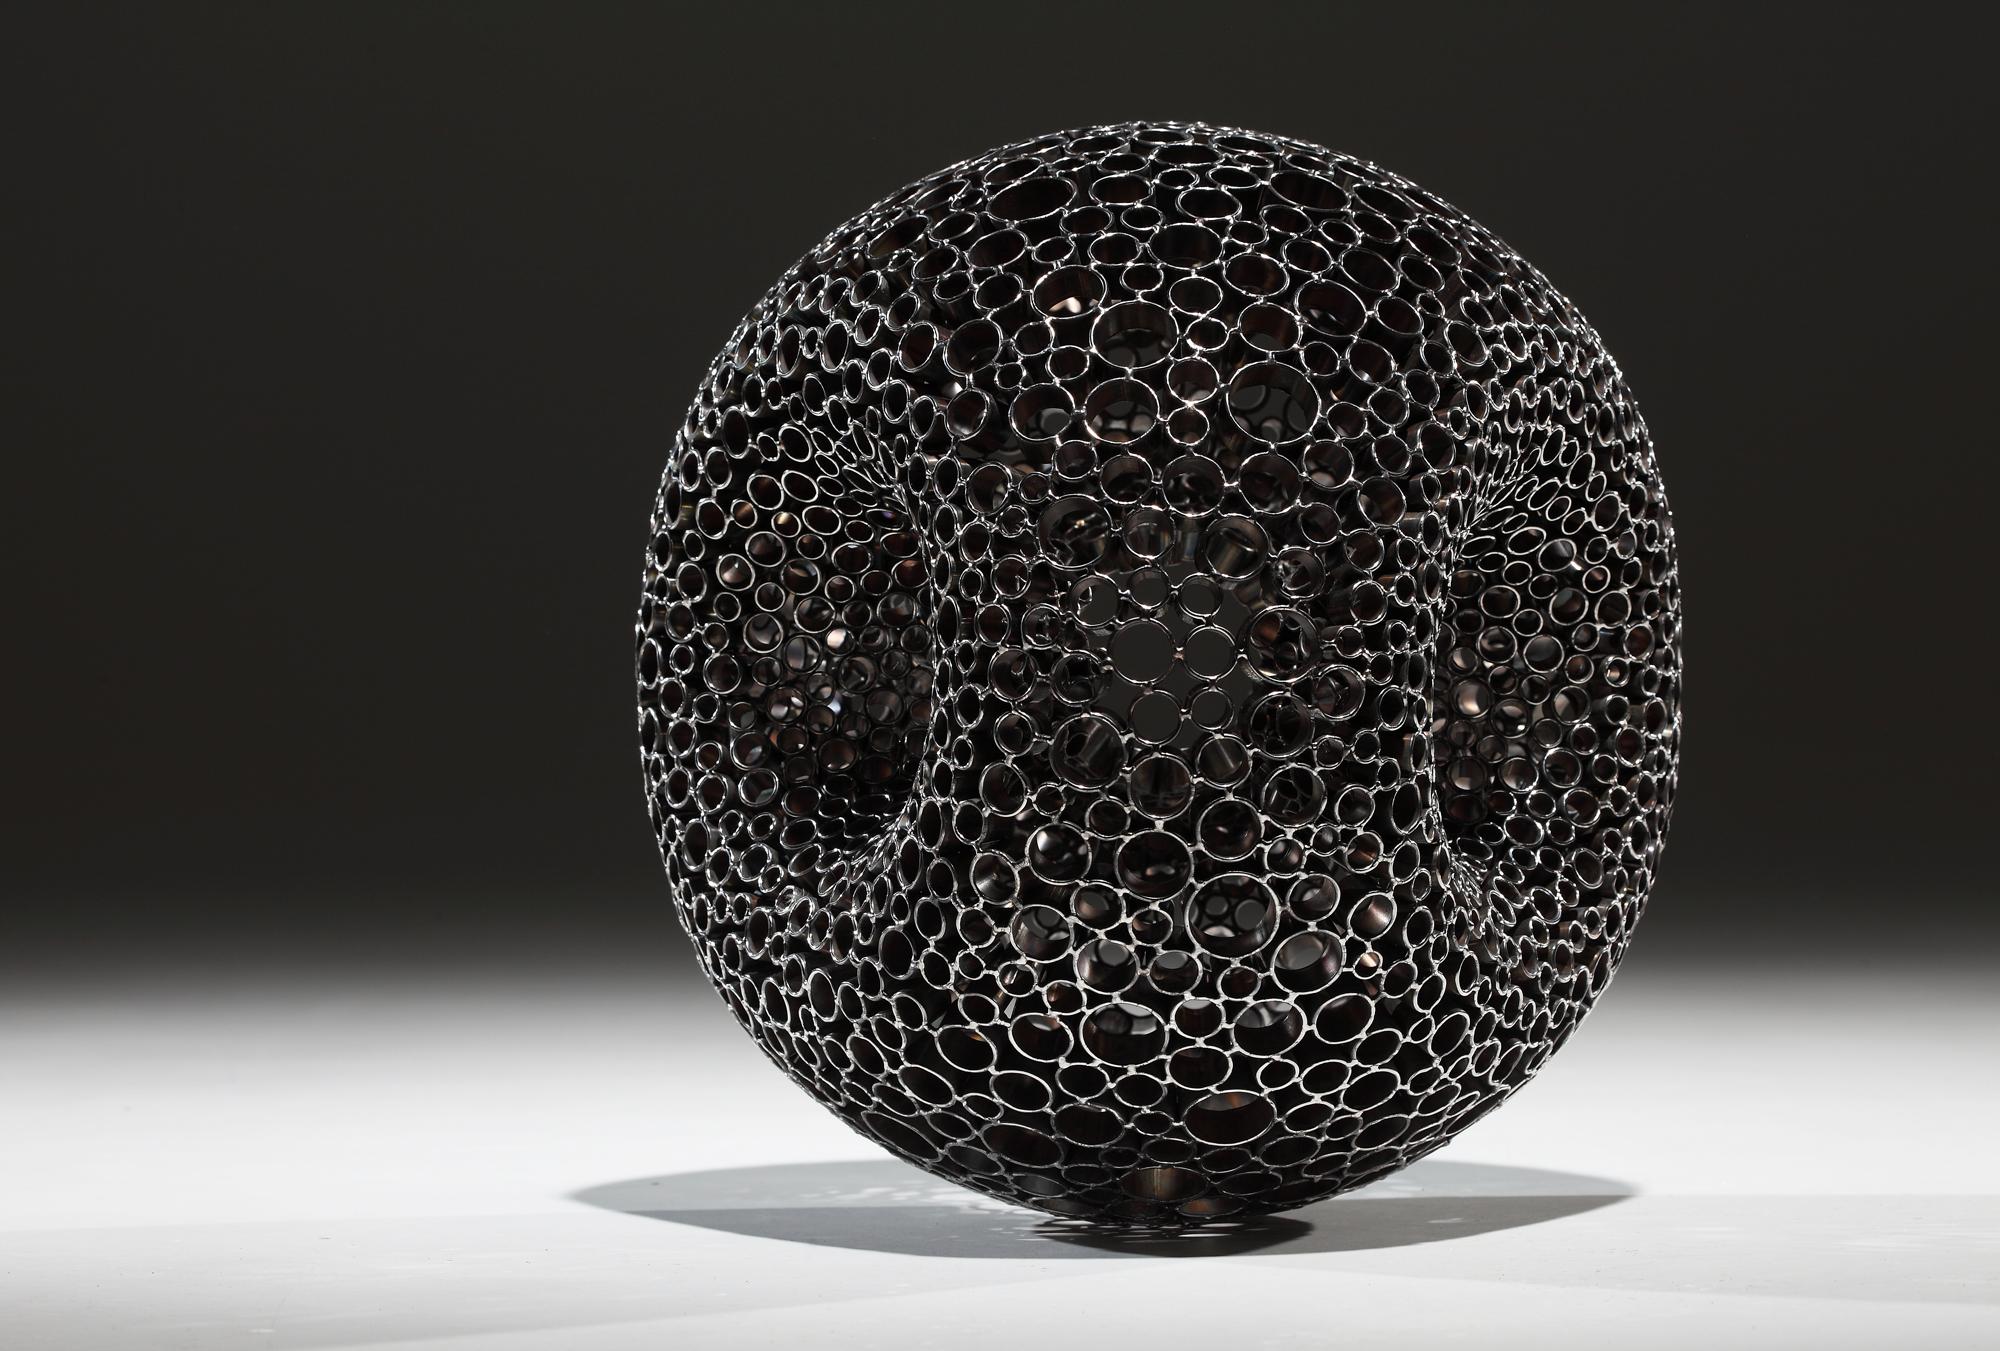 Particle 431022Ⅷ by Jang Yong Sun